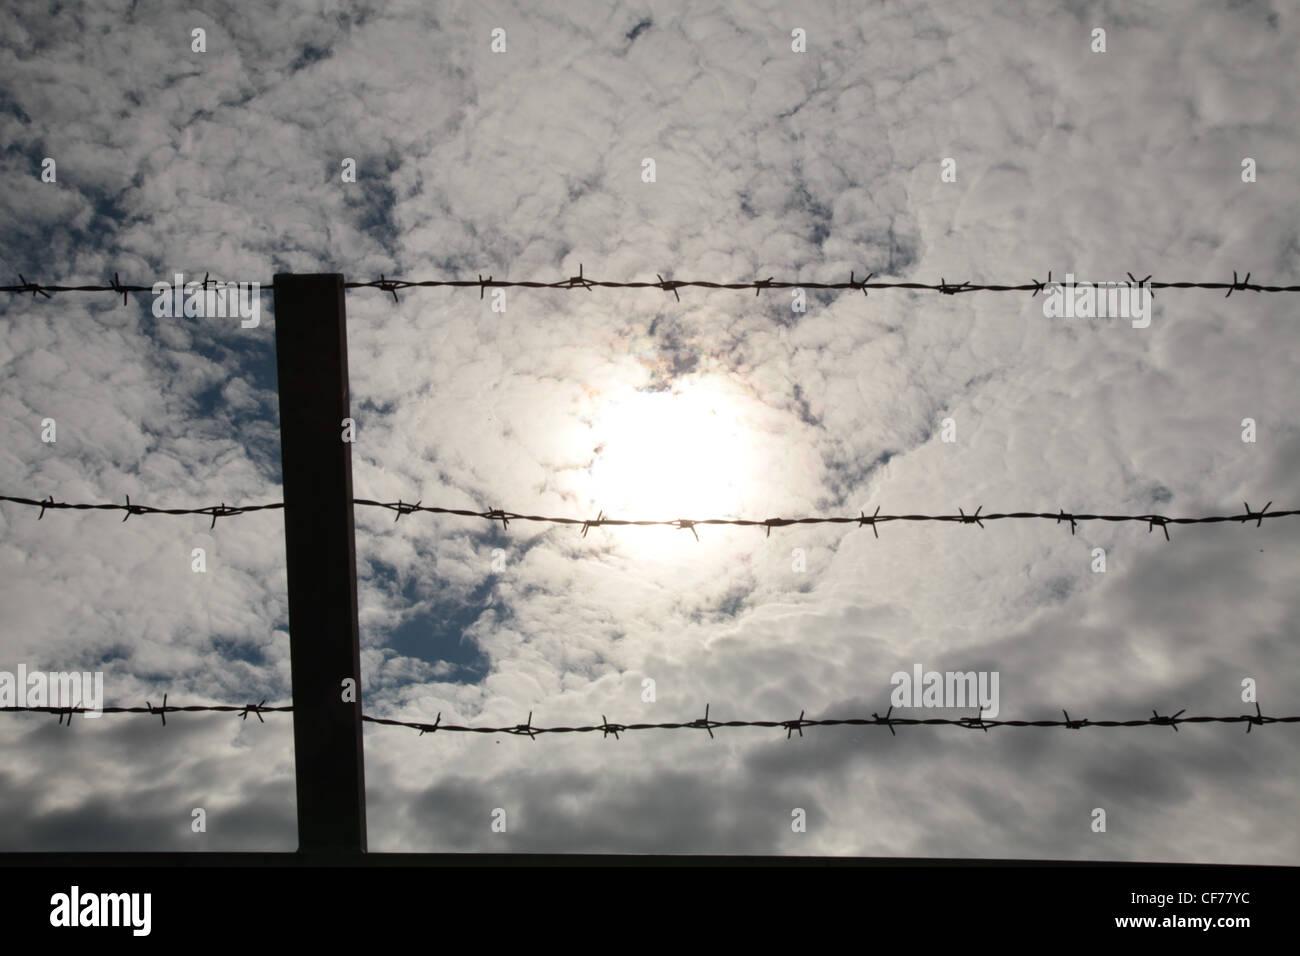 Szene Mit Stacheldrahtzaun in Diffusem Licht, Szene mit diffusem Licht und Stacheldrahtzaun Stockbild